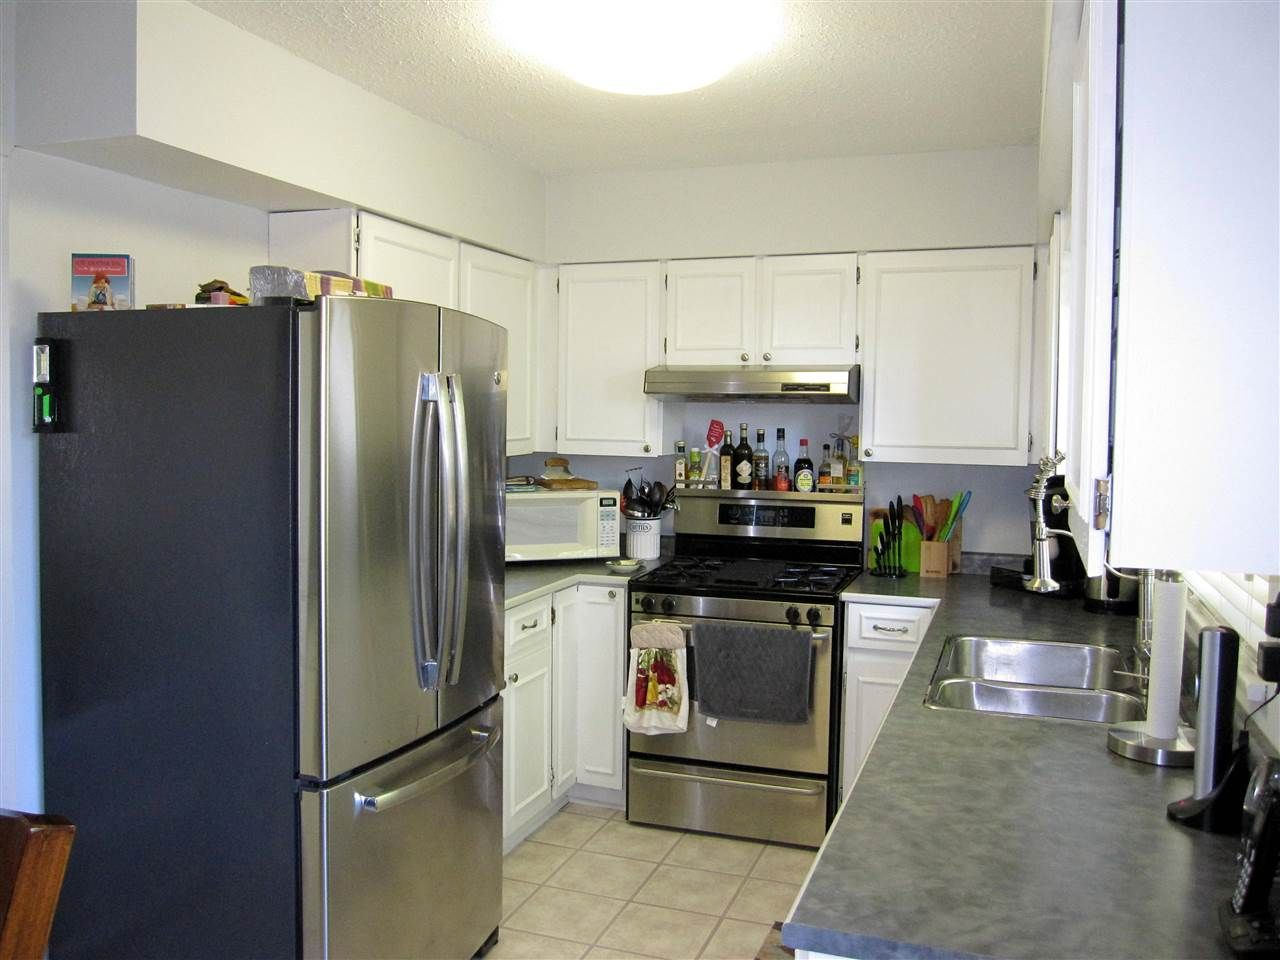 Photo 5: Photos: 21155 CUTLER Place in Maple Ridge: Southwest Maple Ridge House for sale : MLS®# R2101980